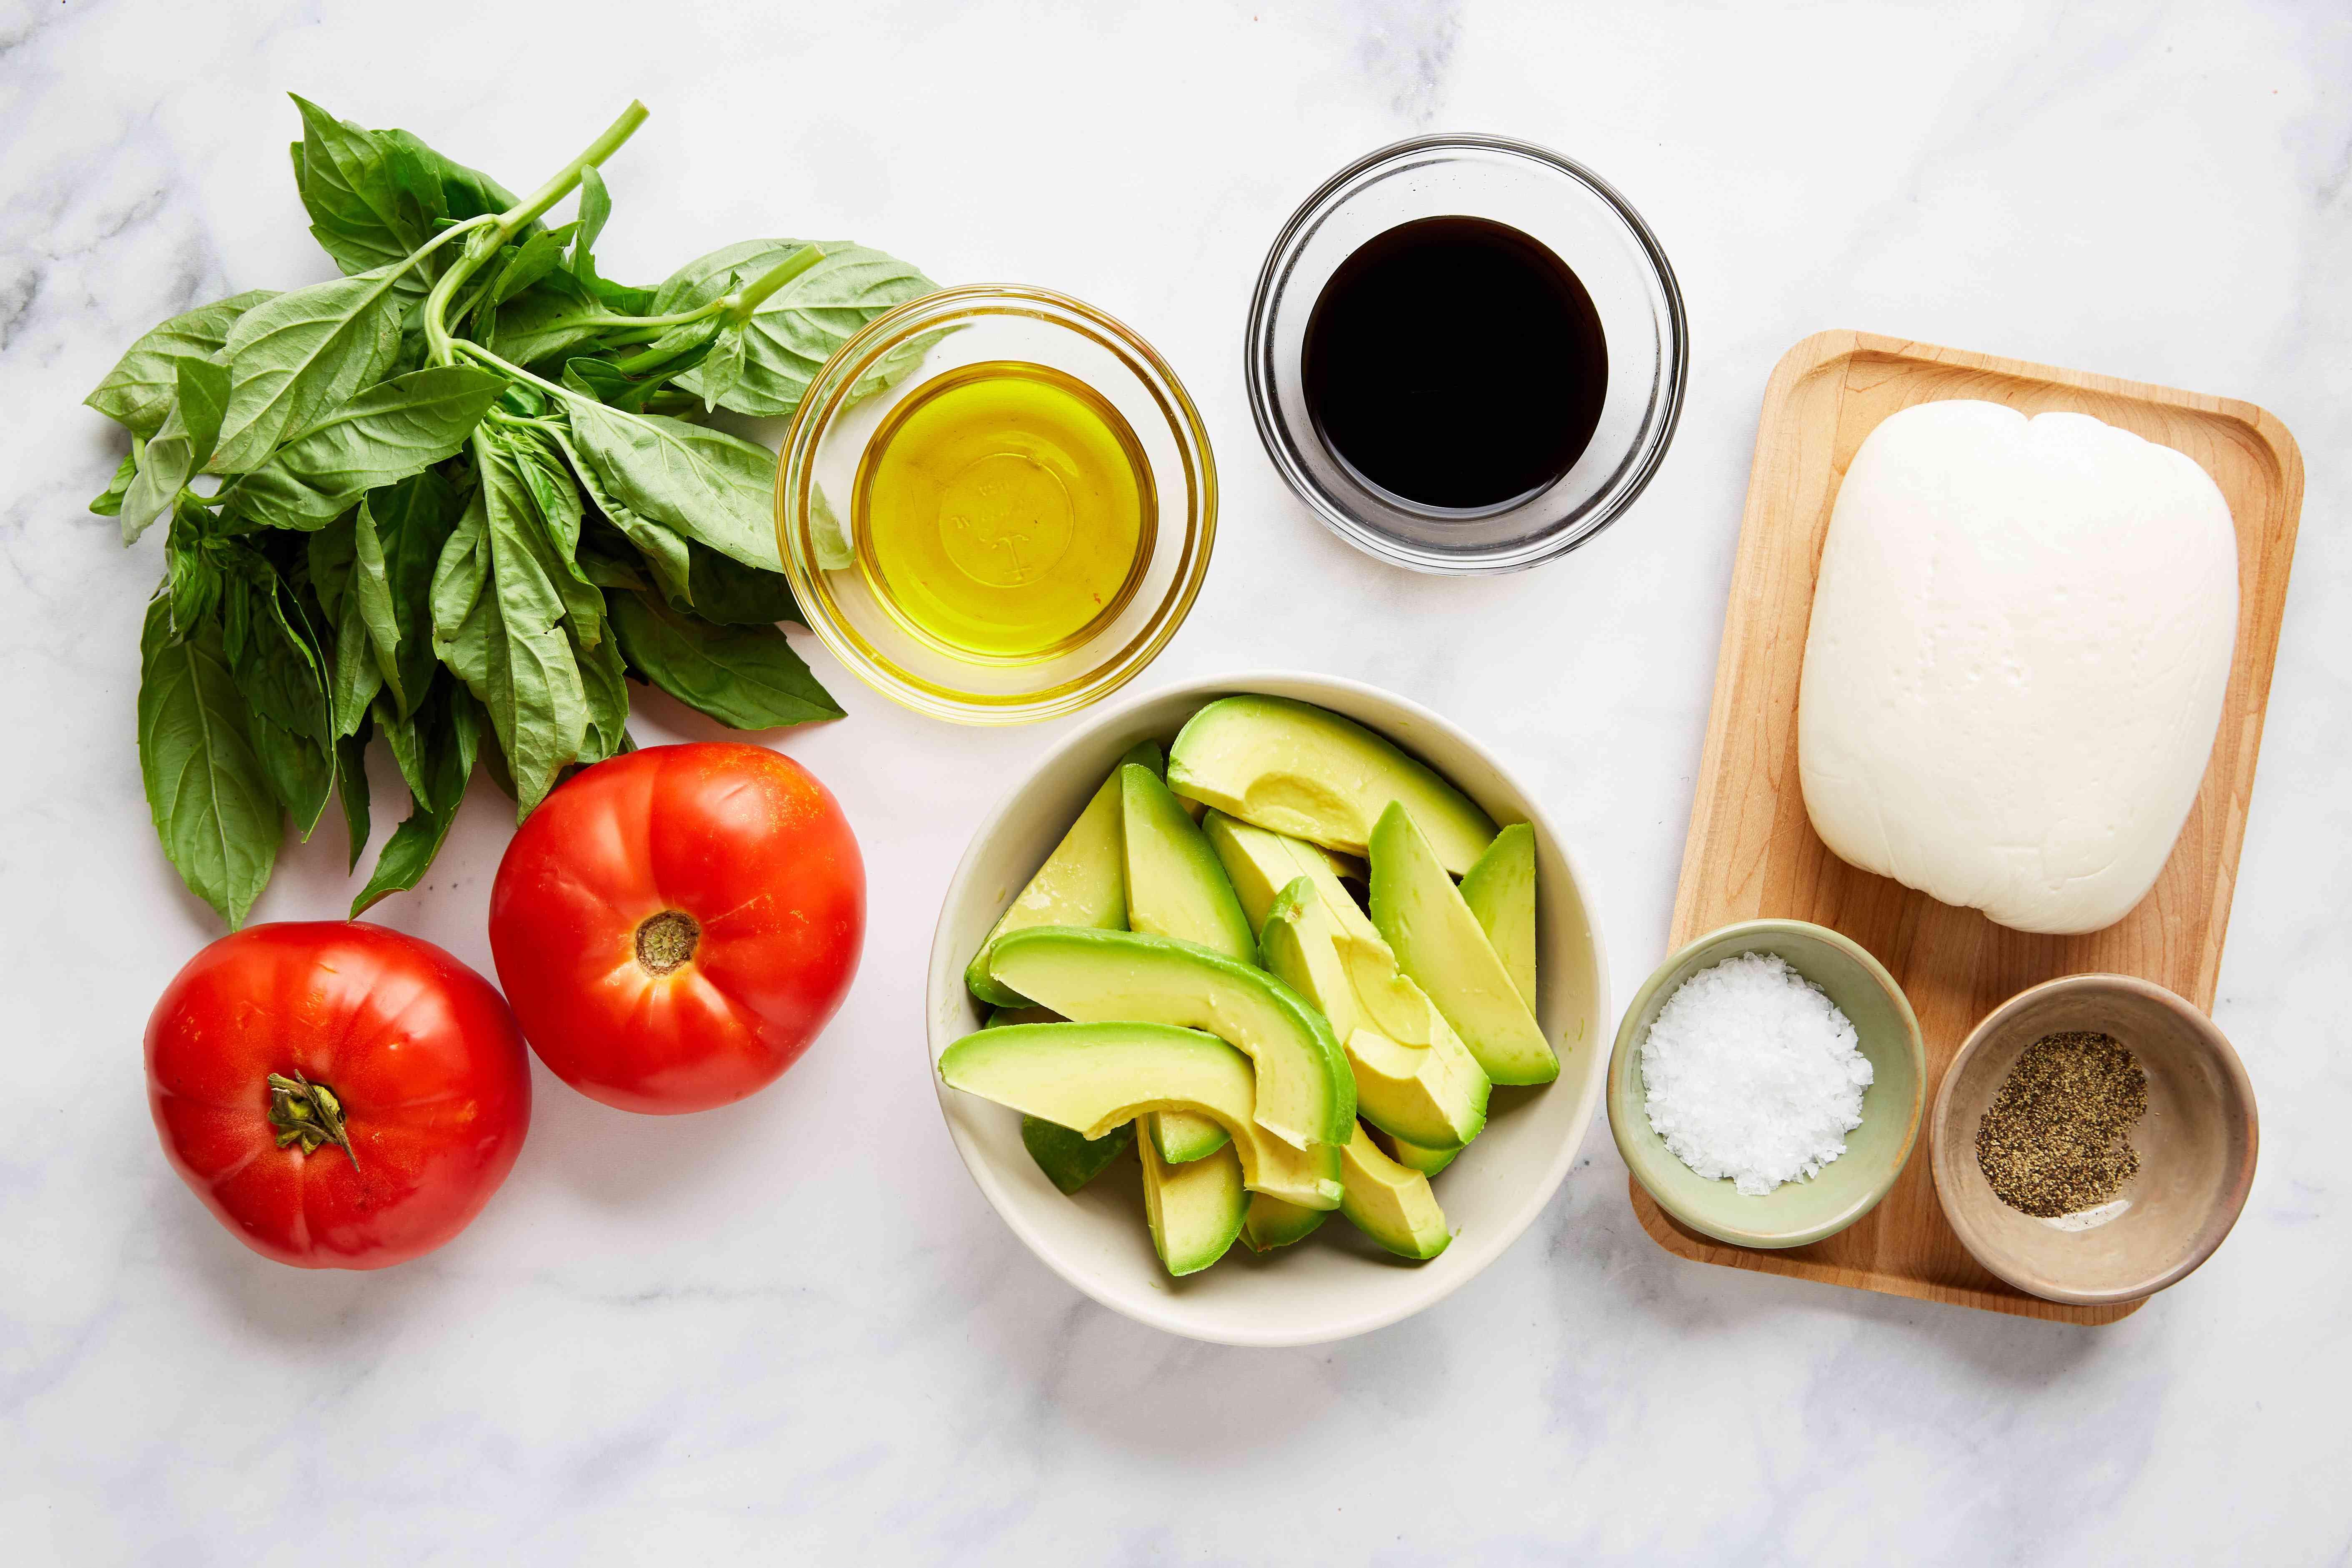 Ingredients for avocado tomato and mozzarella salad